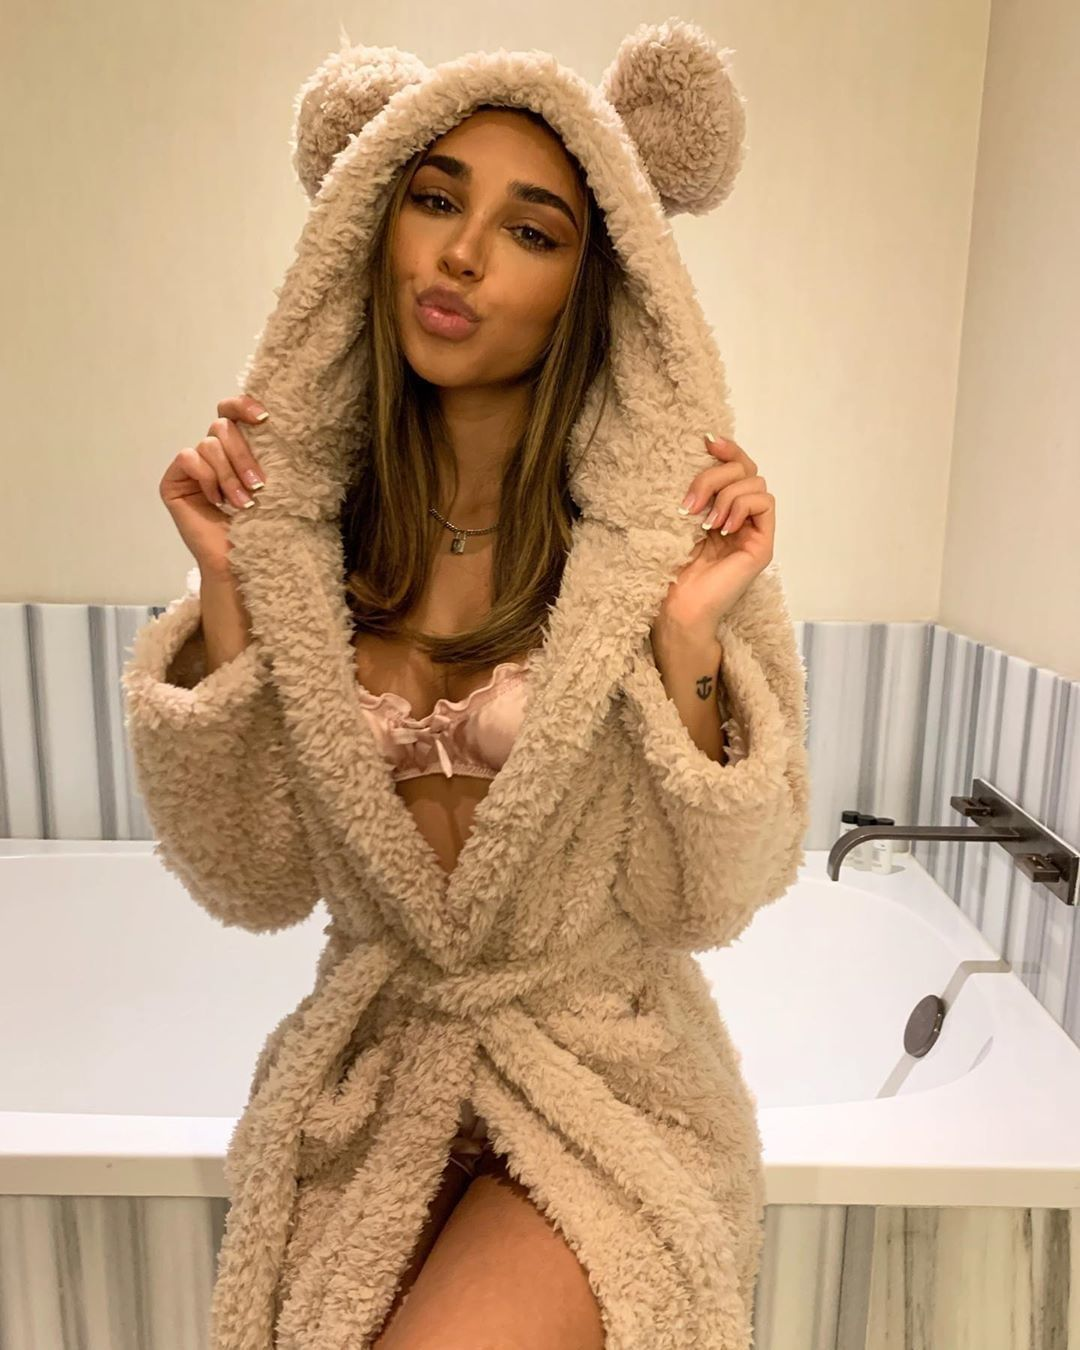 2020 Winter Kimono Robe Plush Fleece Scalloped Bath Robes For Women Soft Warm Long Sleeve Hooded Nig